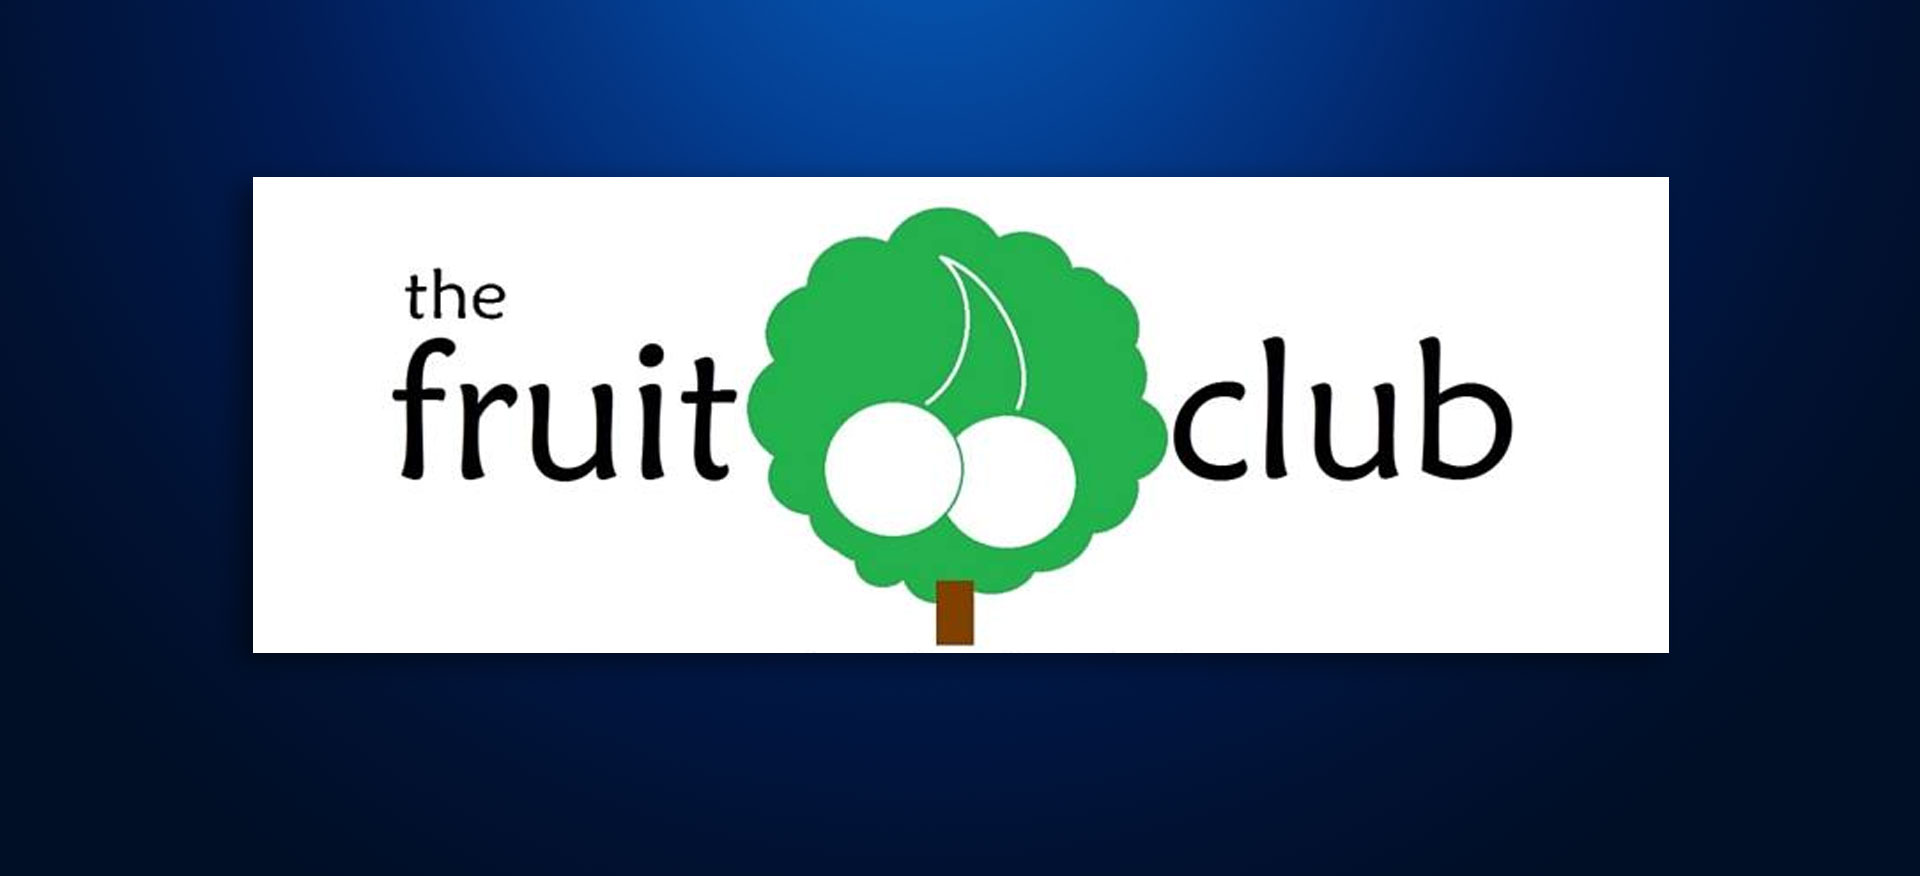 The Fruit Club logo Sioux Falls